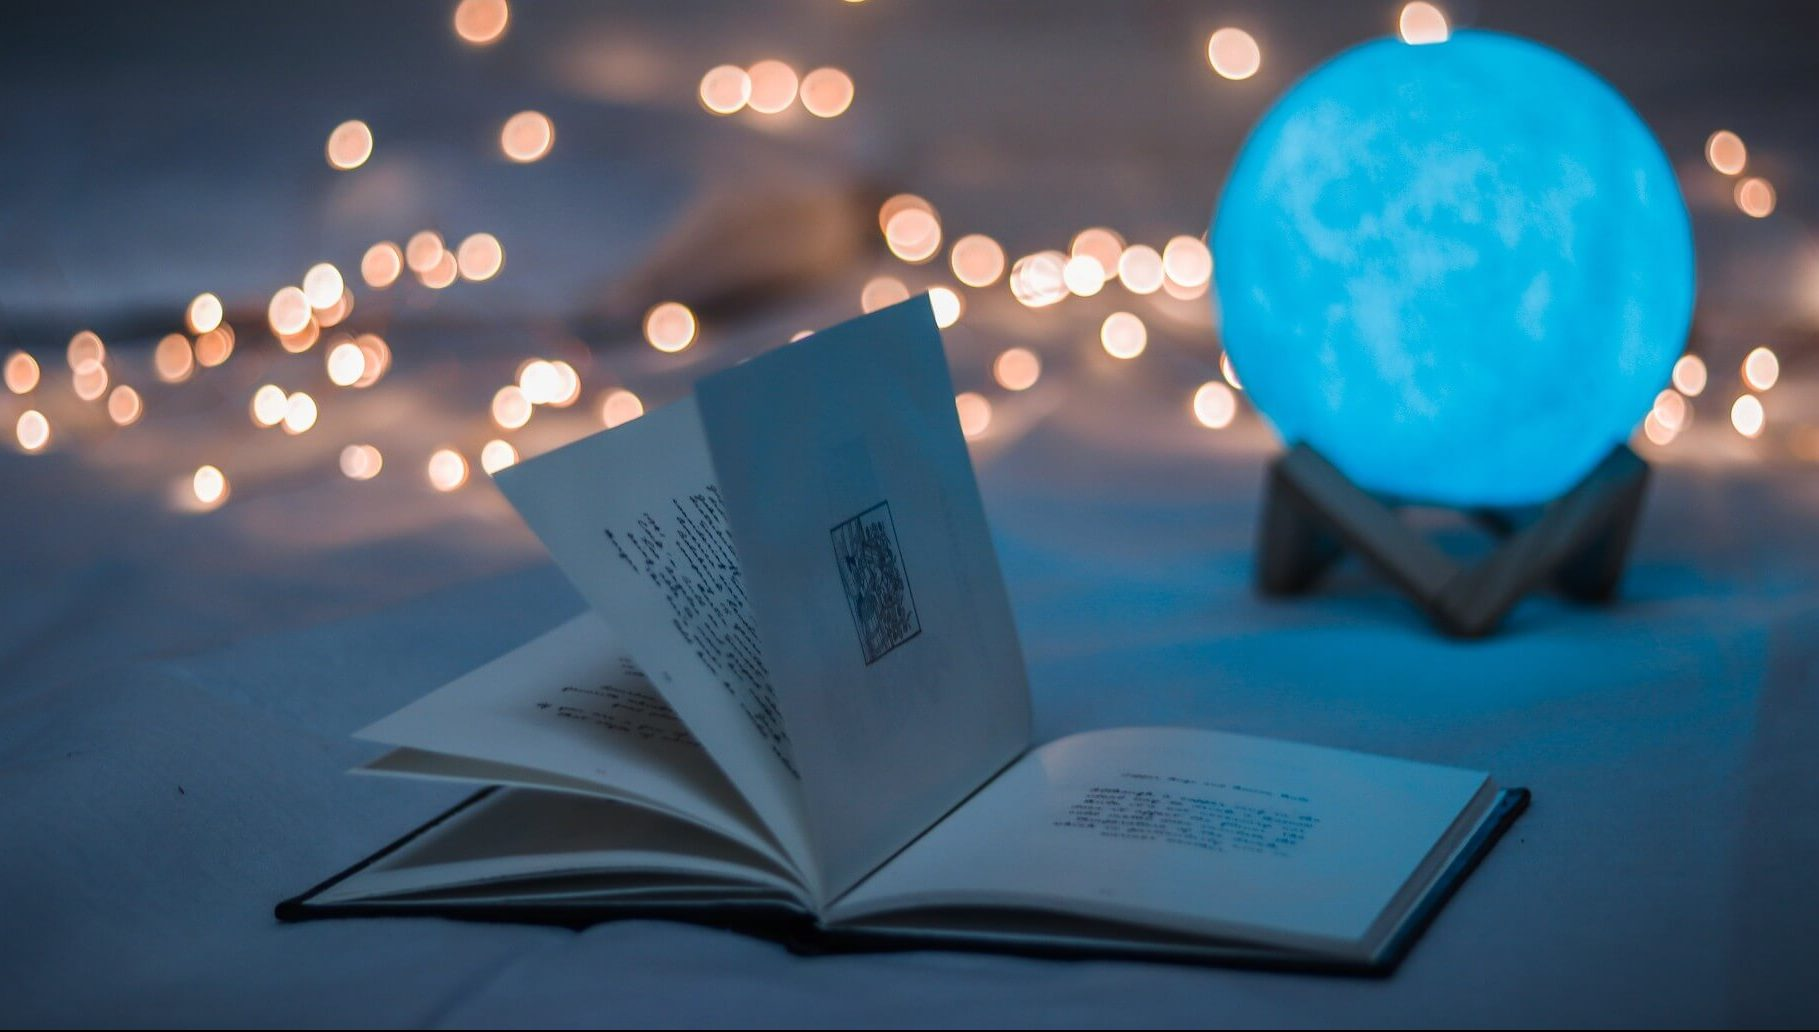 Make a dedication in the Book of Memories